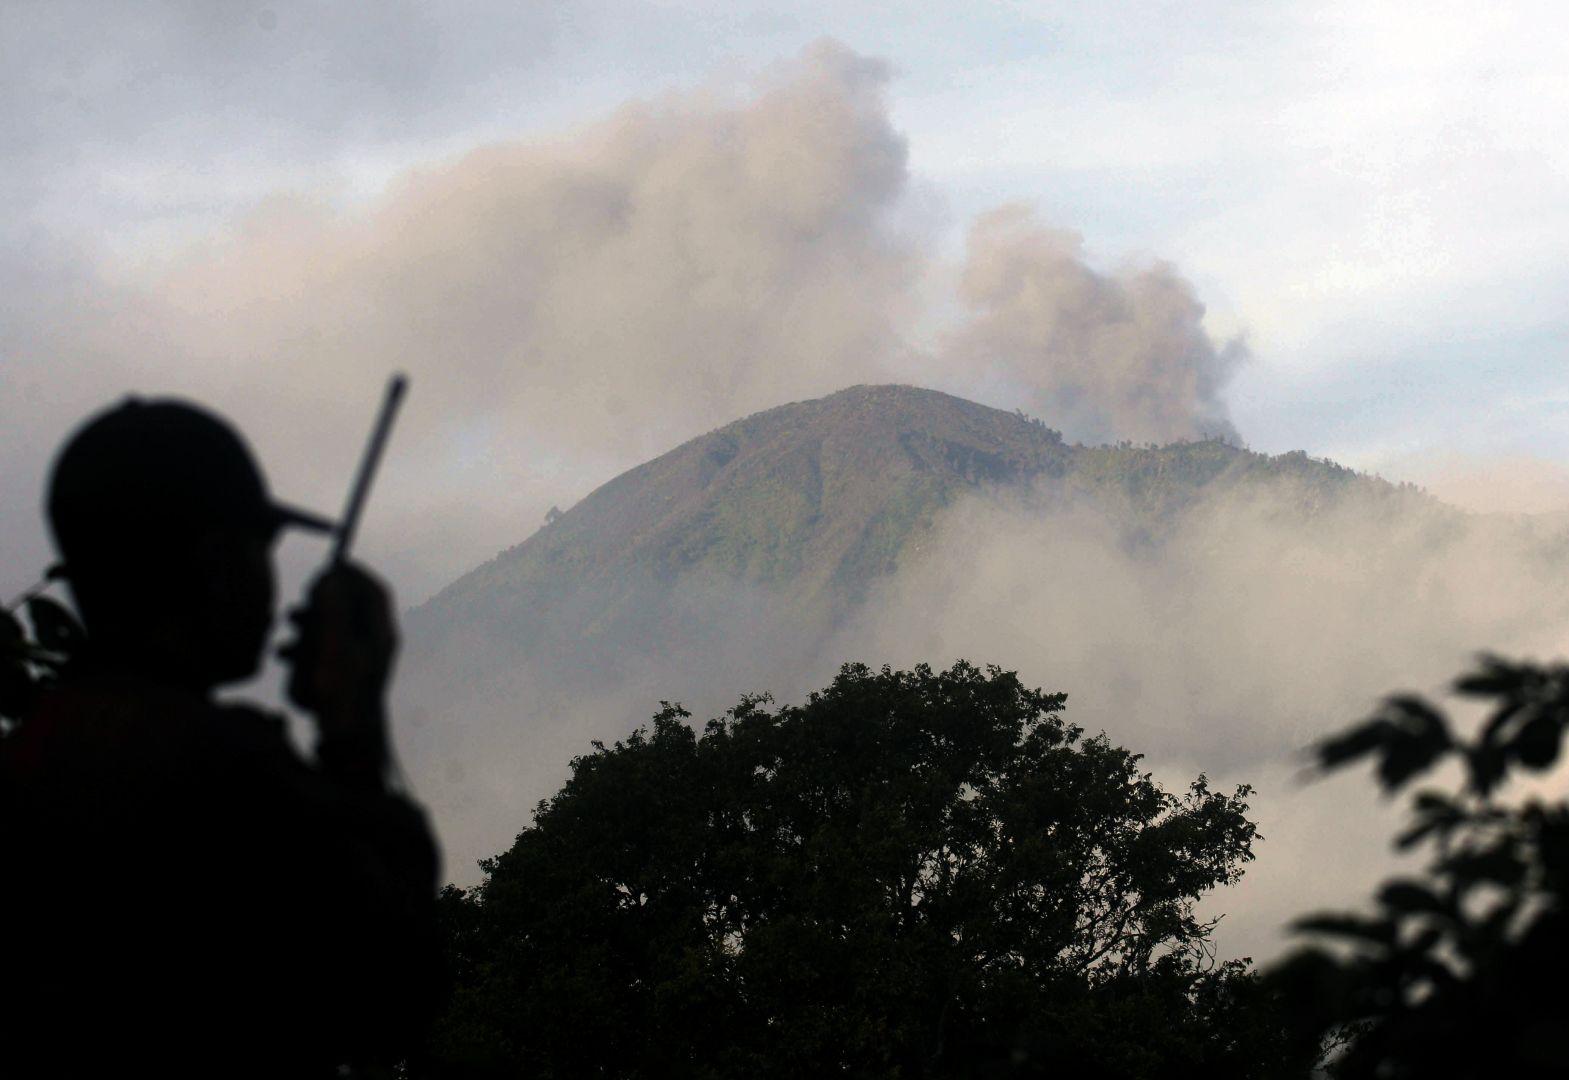 eruptionofindonesianvolcanosparkstravelchaos